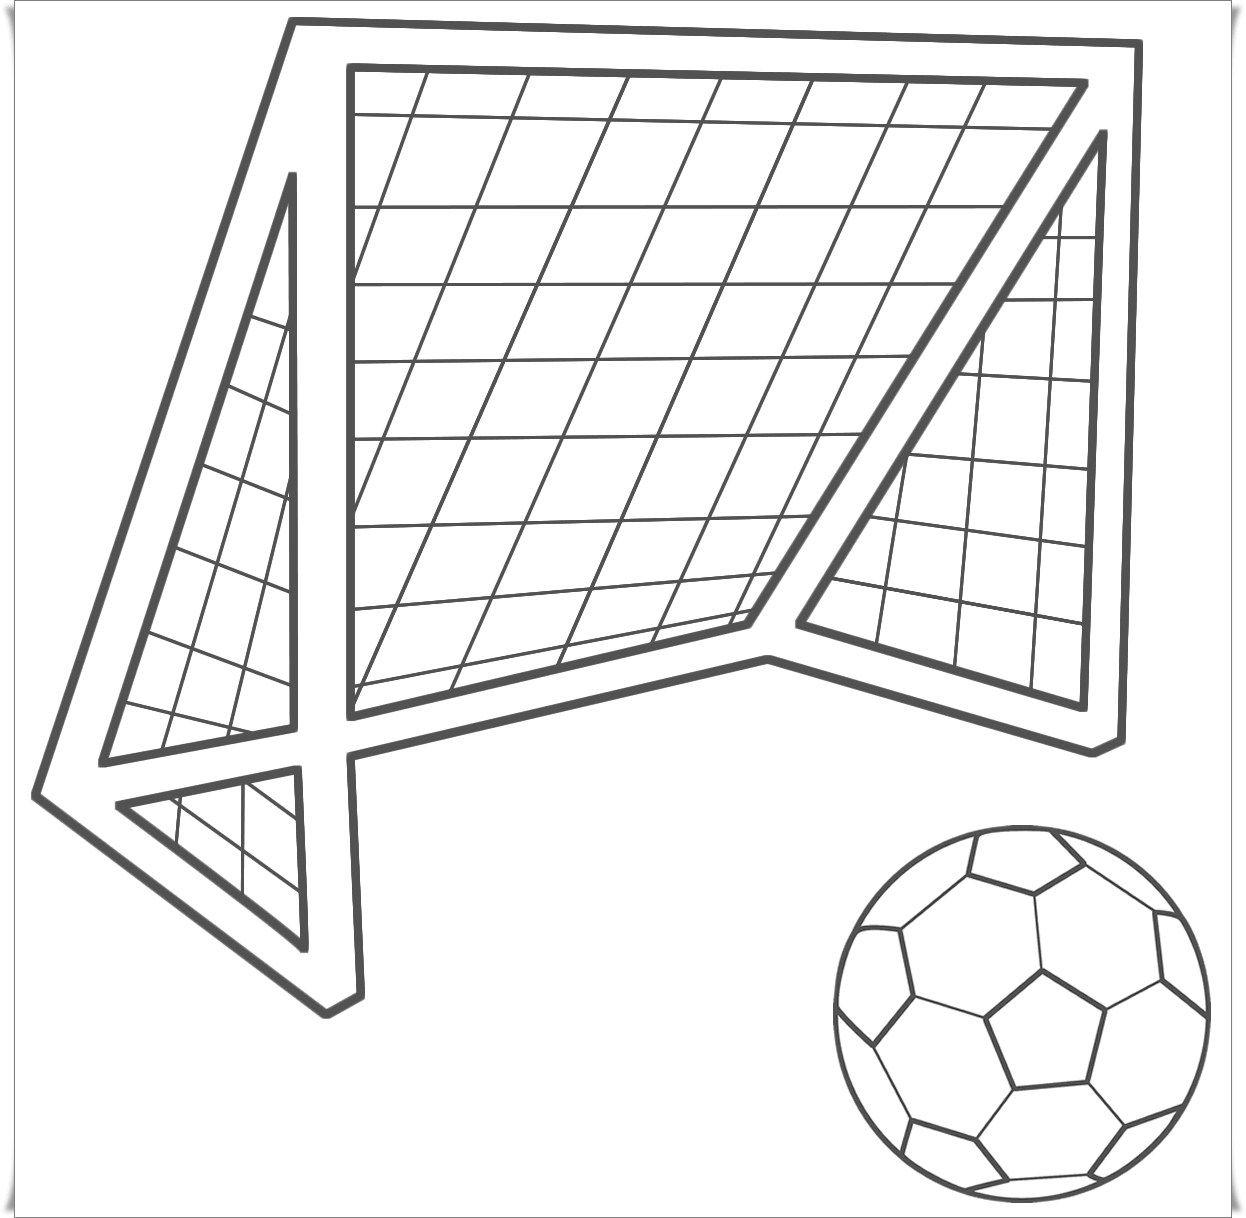 Fussball Malvorlagen Ausdrucken Bola Kaki Warna Gambar